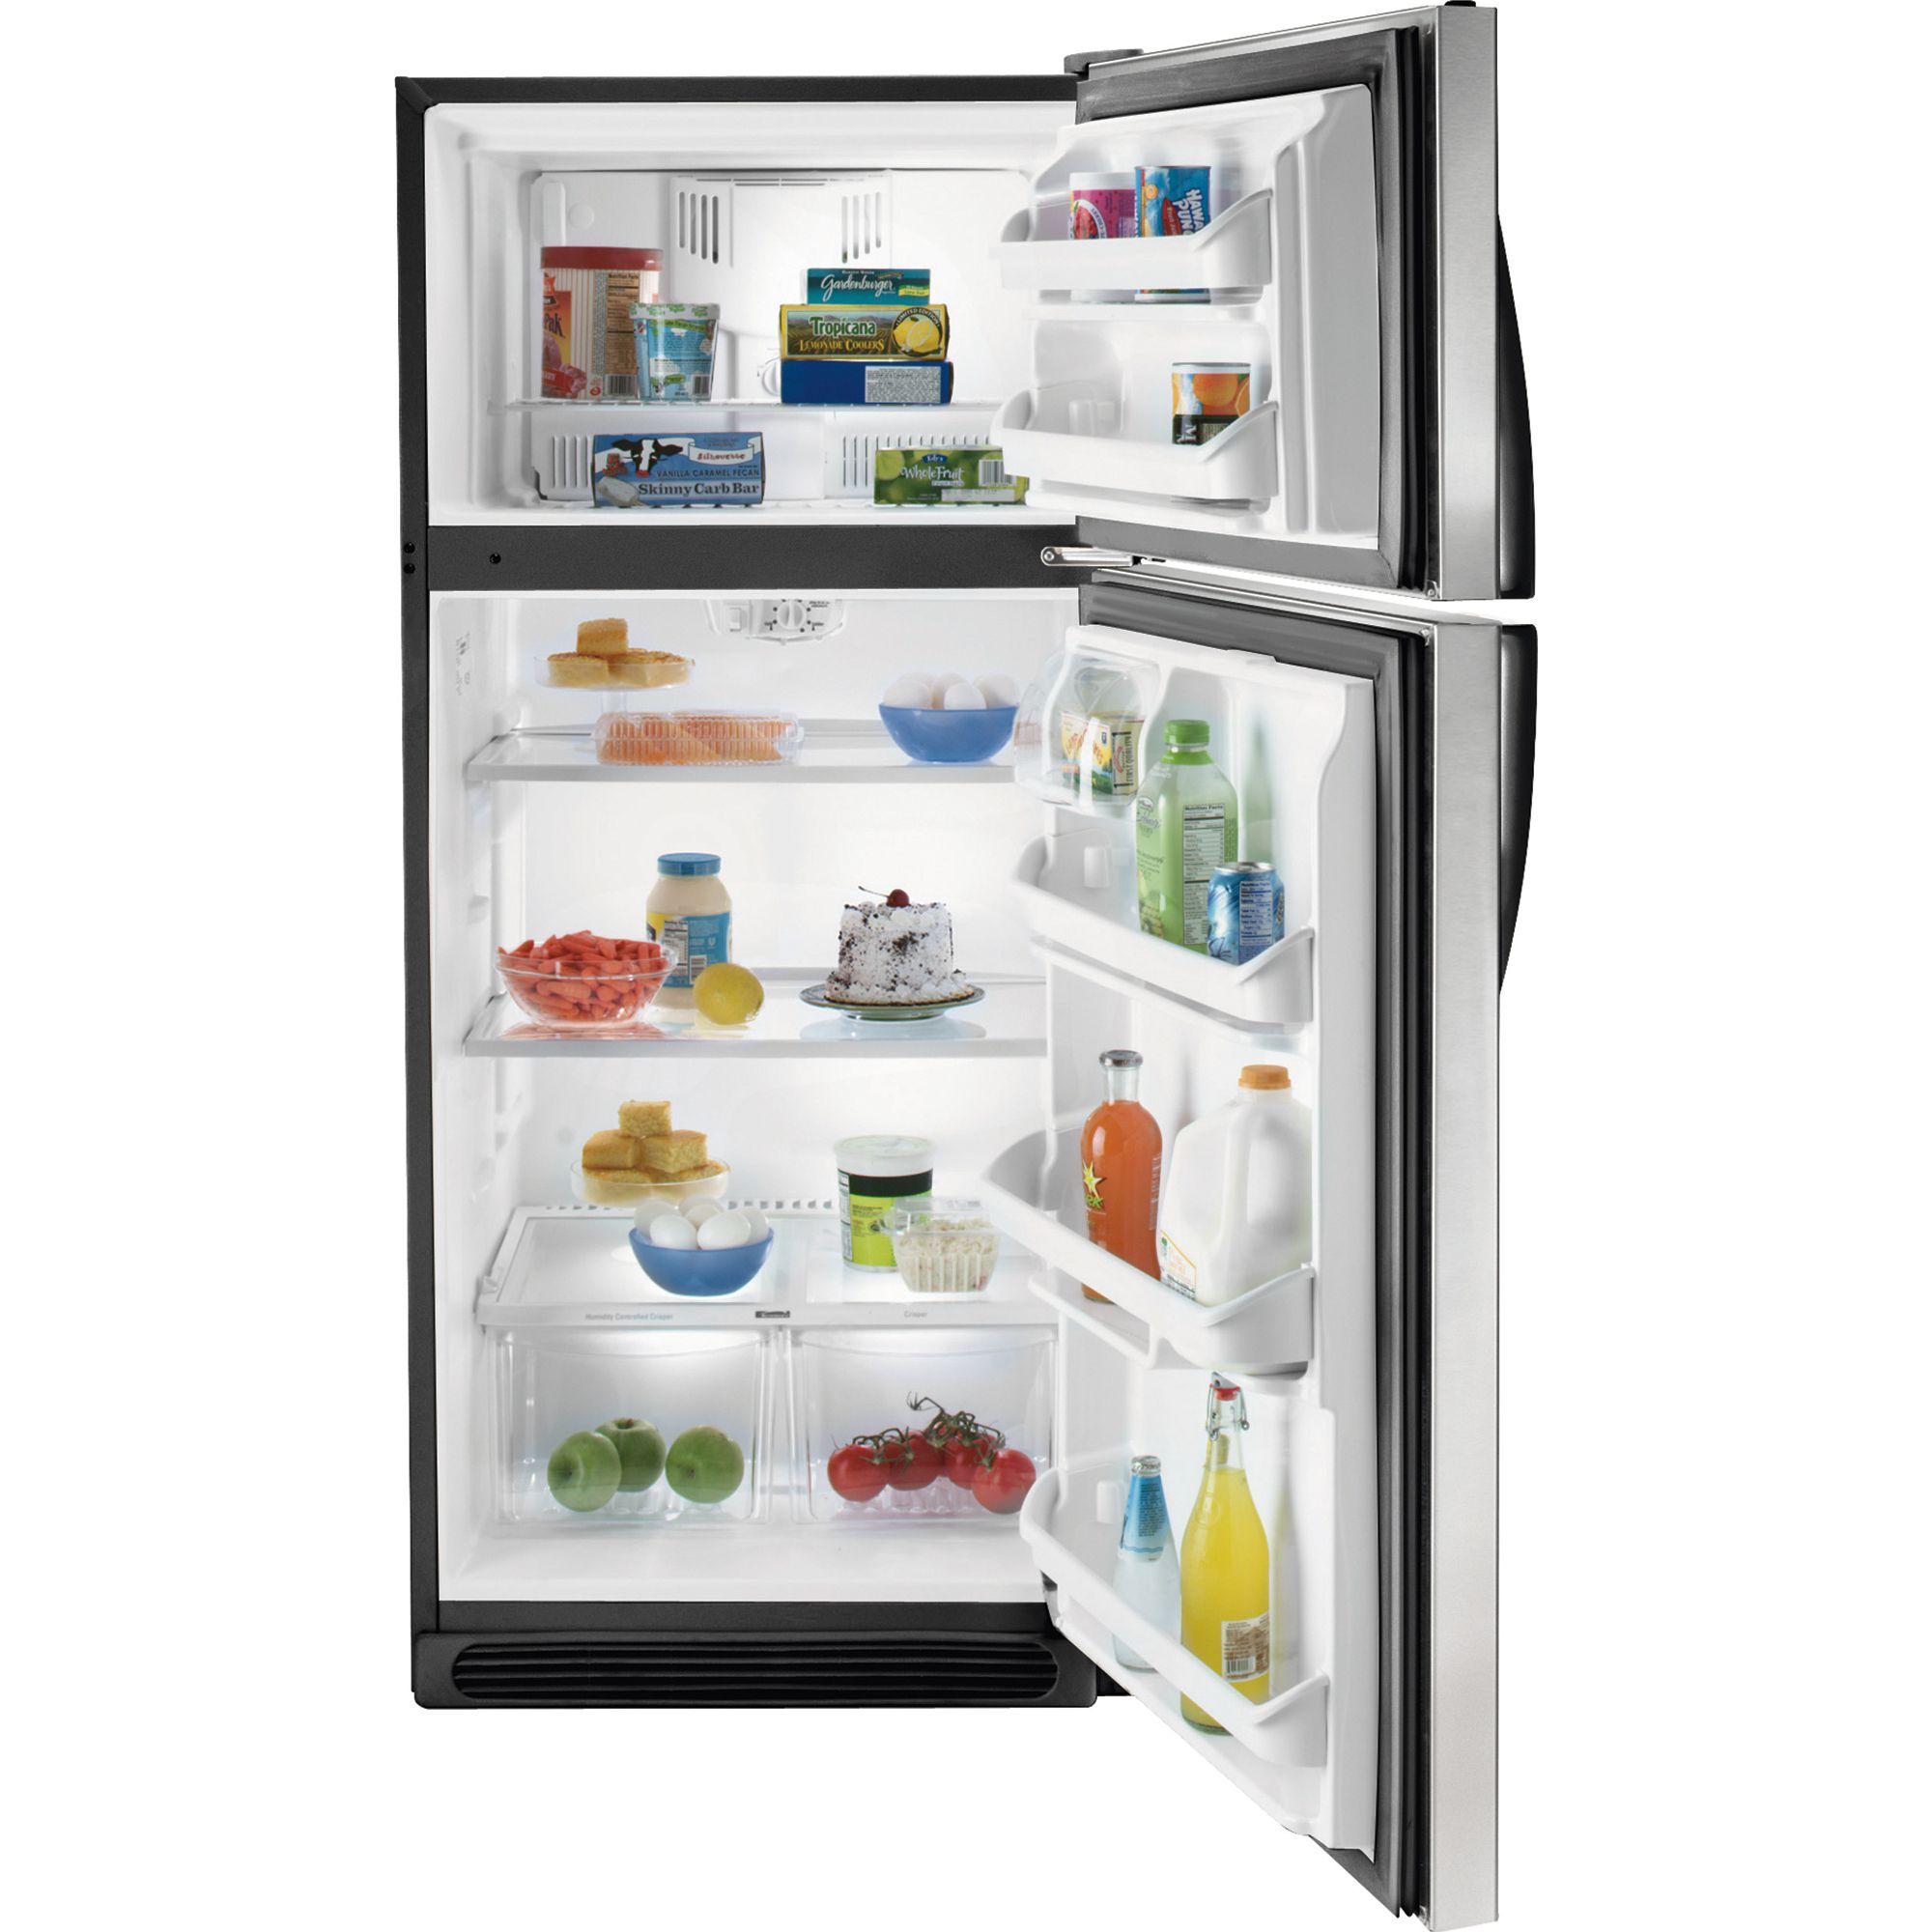 Kenmore 18.2 cu. ft. Top-Freezer Refrigerator - Stainless Steel